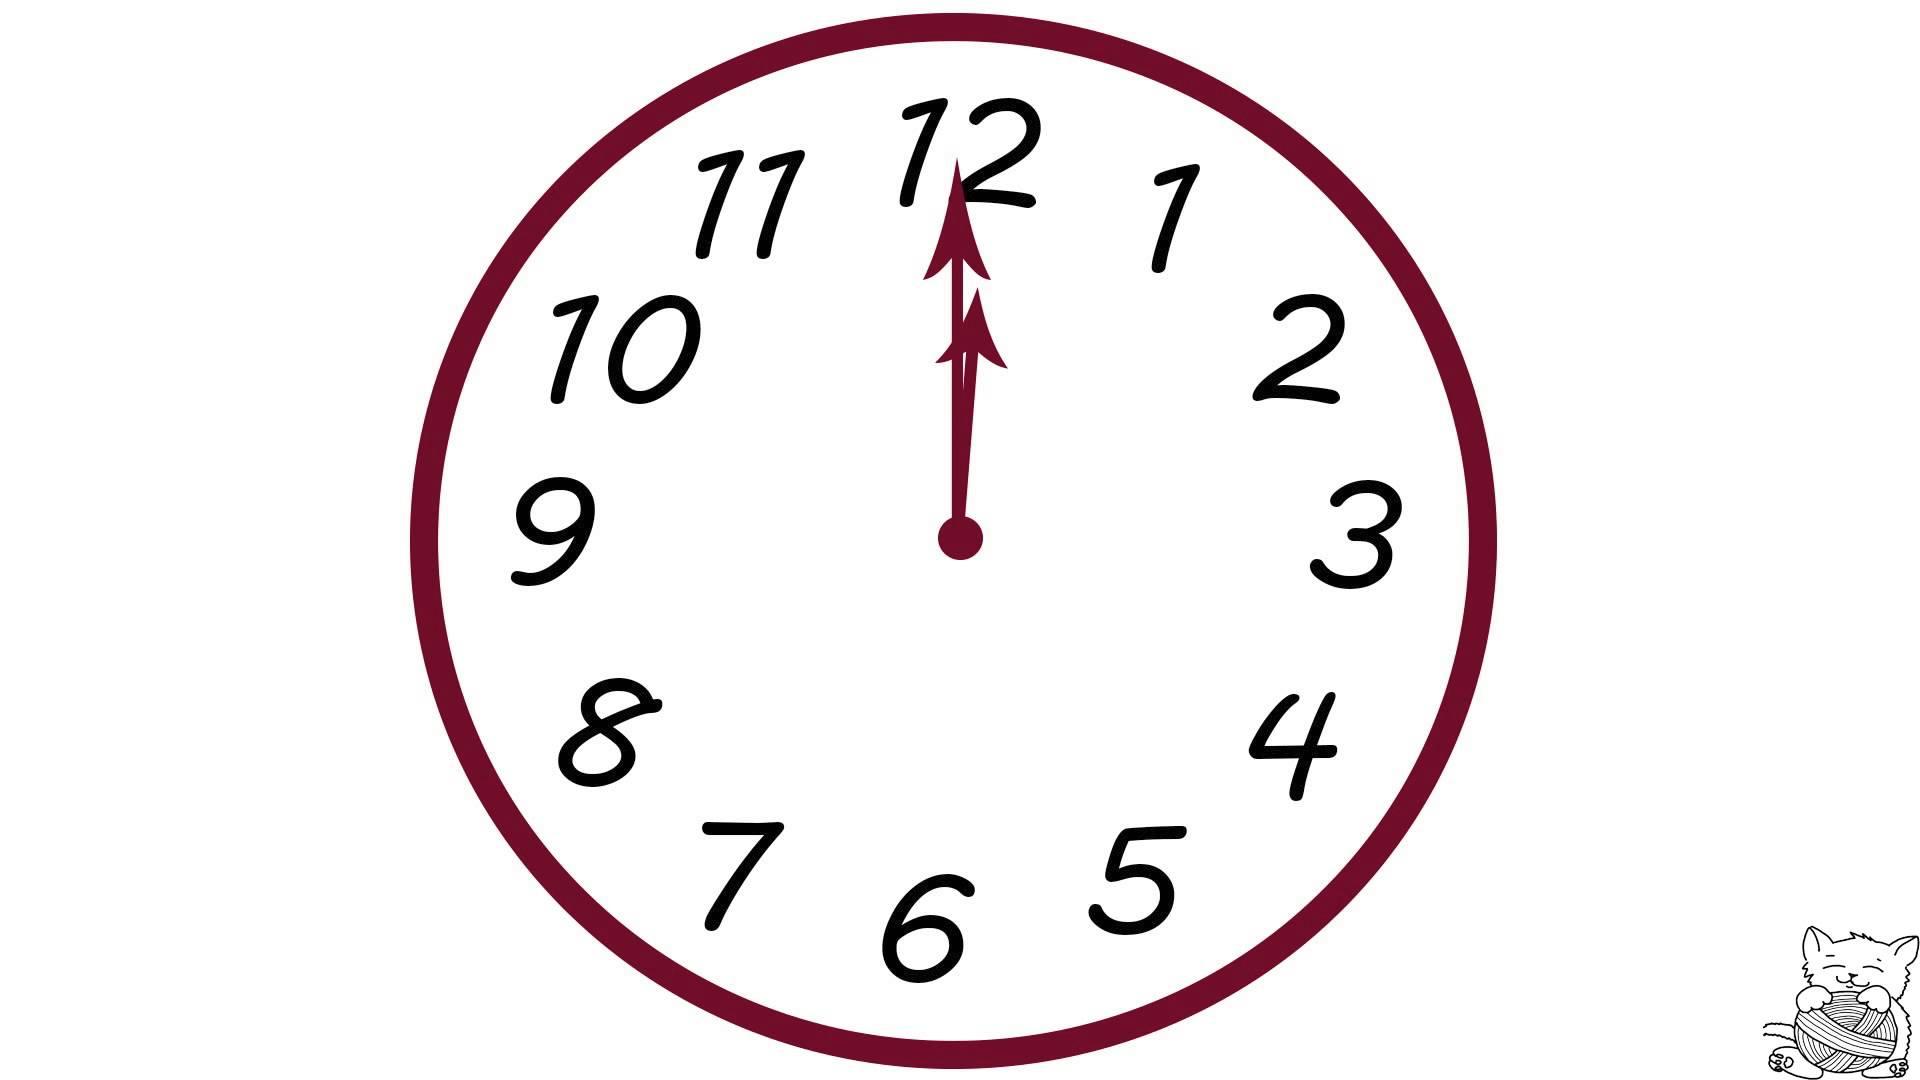 Drawn clock Clock Analog about What drawn